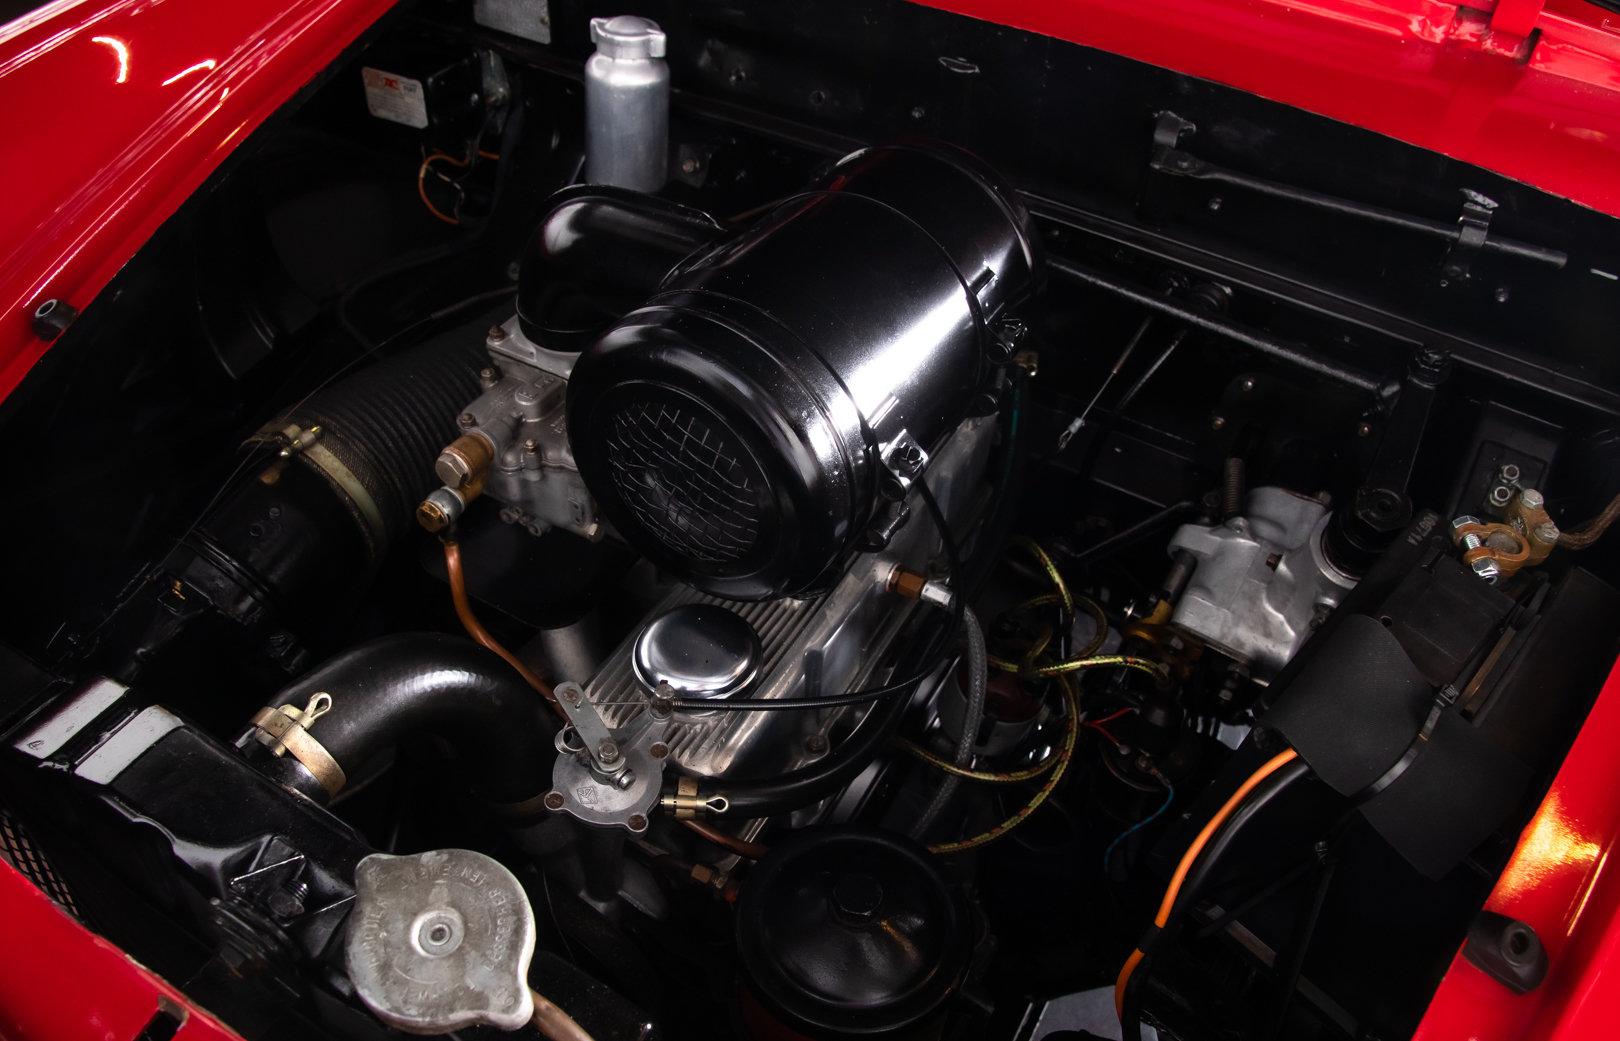 FIAT 1100/103 TV COUPè PININFARINA - 1954 For Sale (picture 6 of 6)